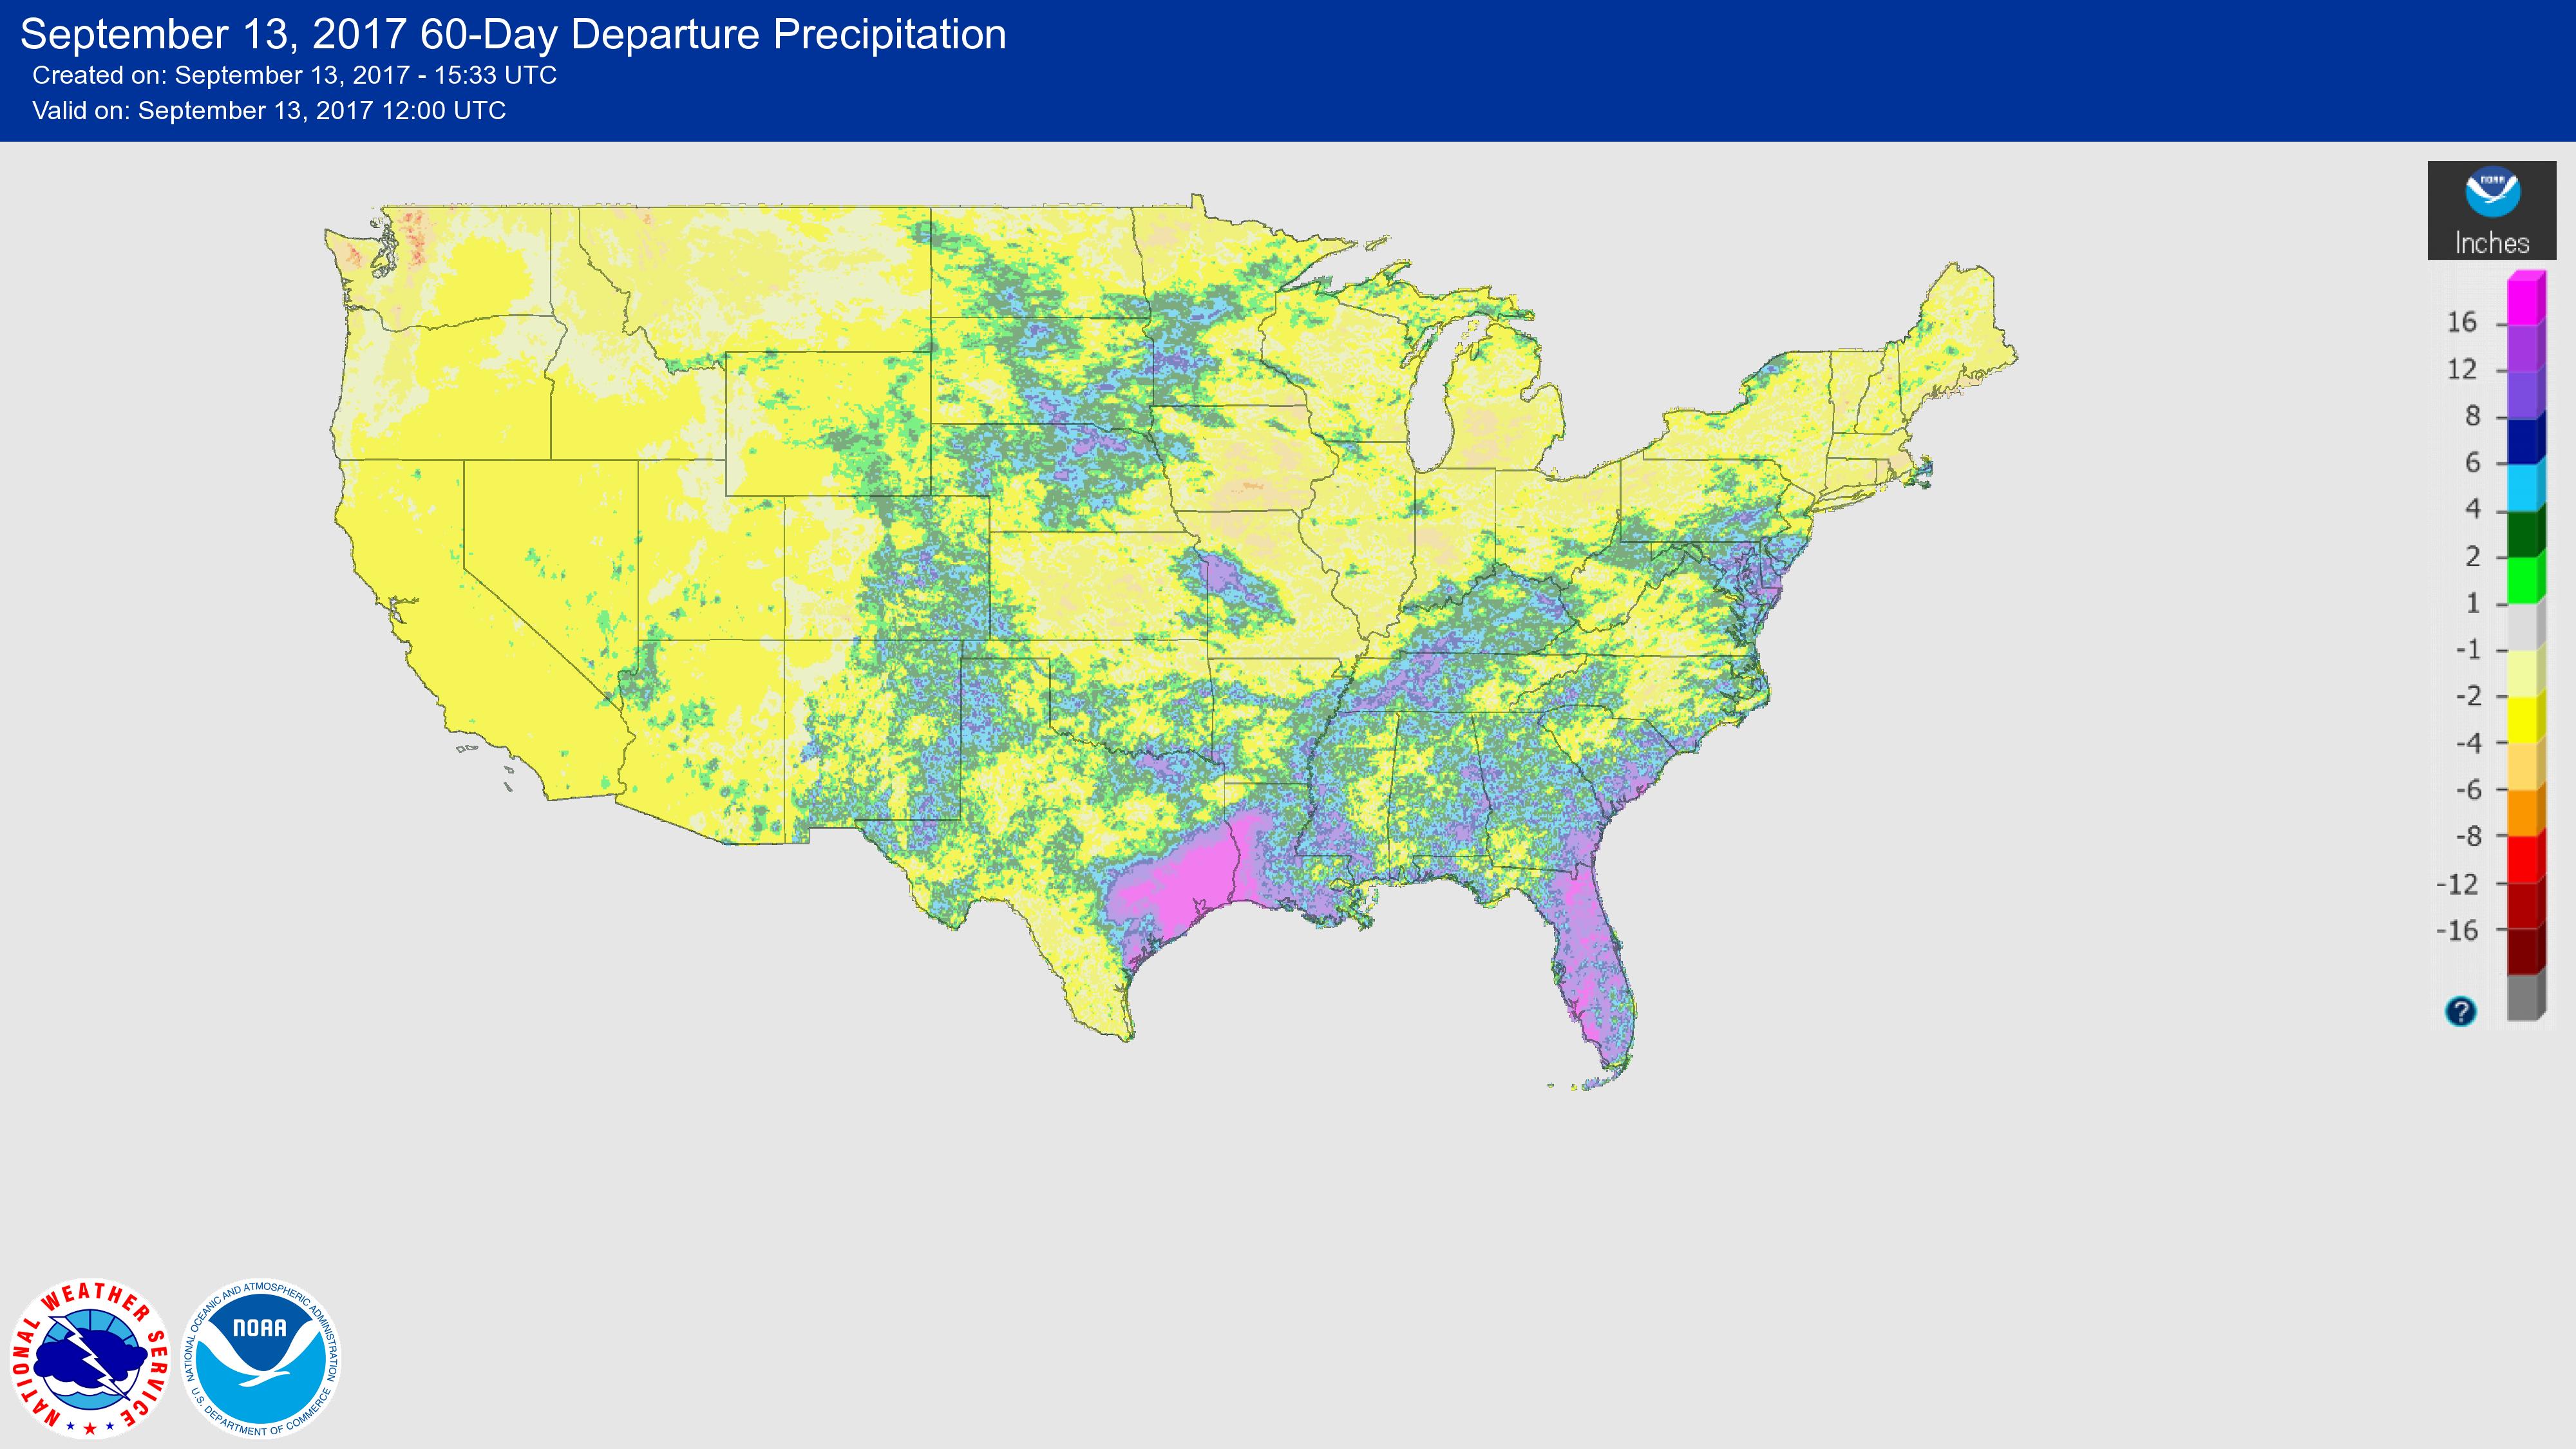 60-day Departure Precipitation.png